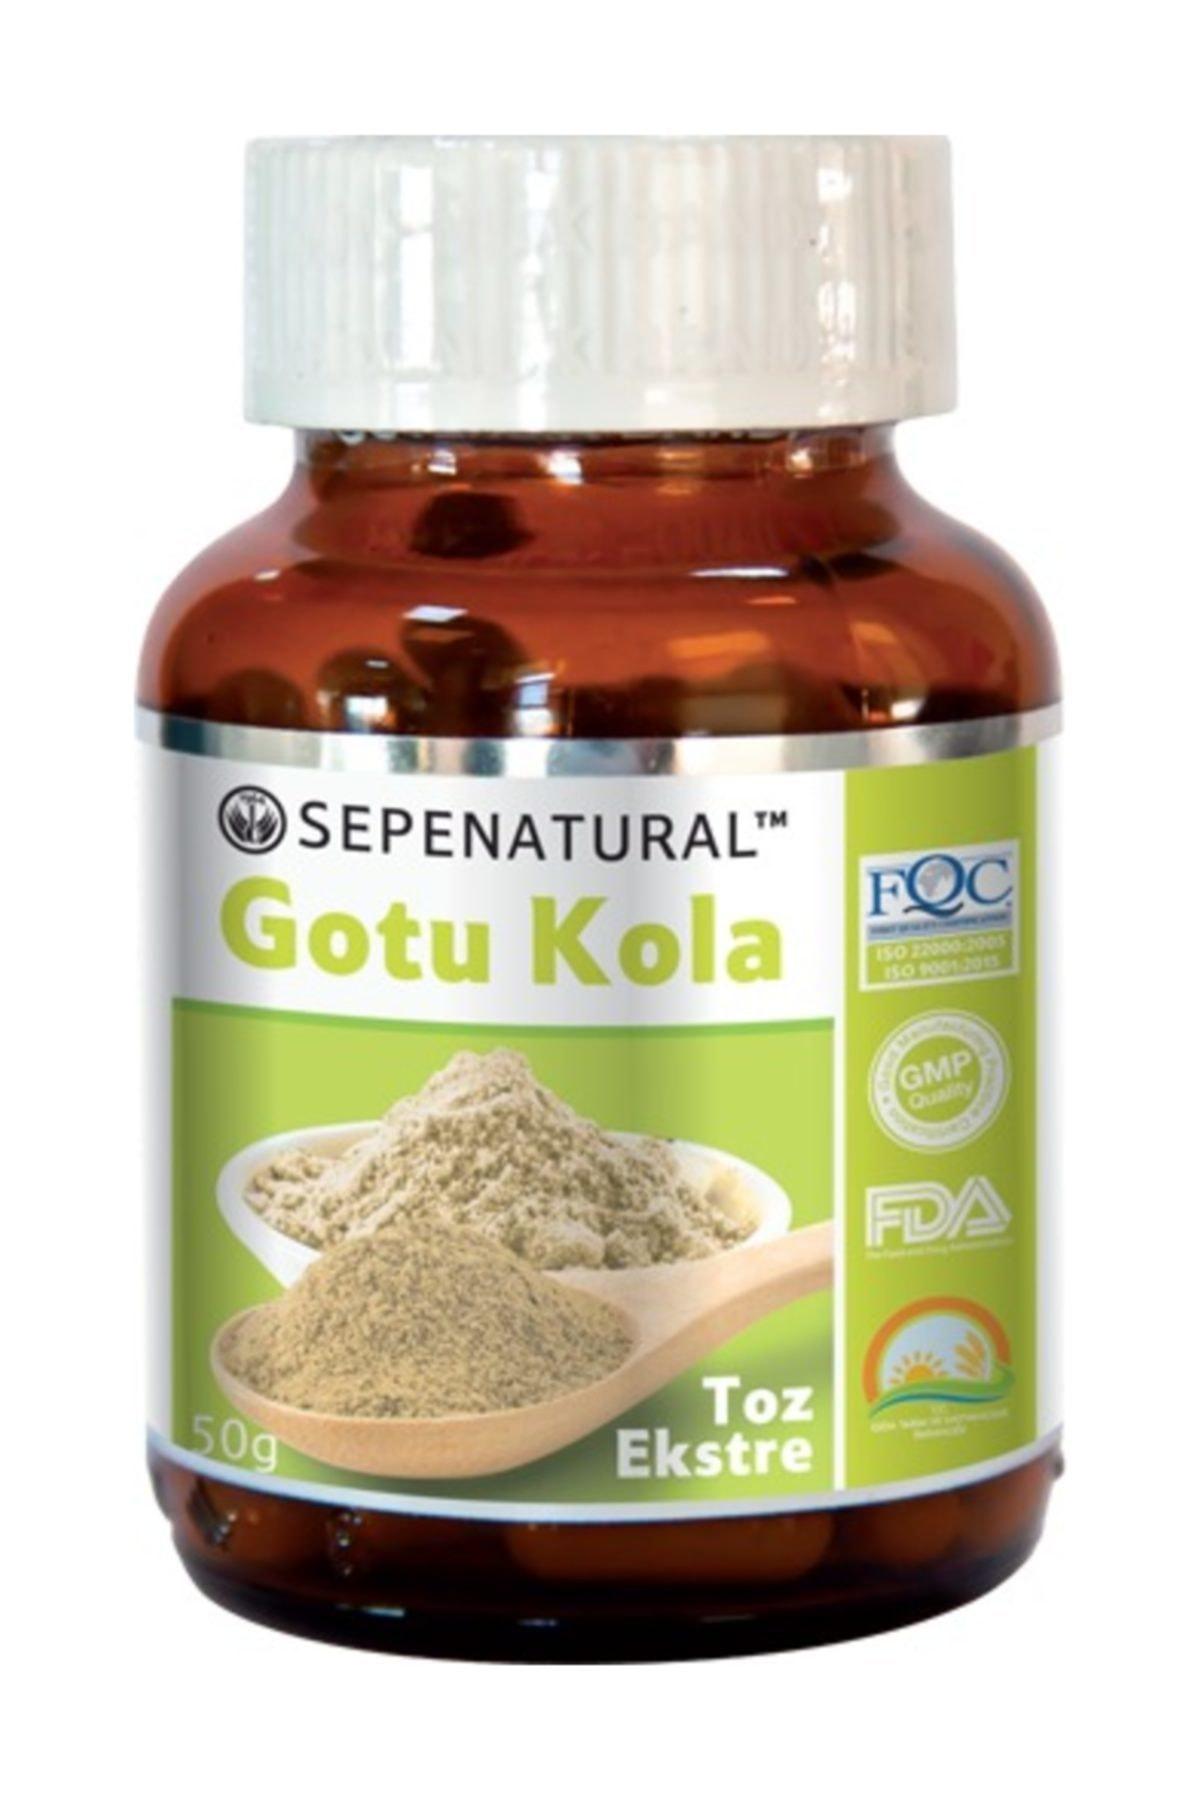 Sepe Natural Gotu Kola Extract Gotu Kola Toz Ekstrakt Ekstresi 50 gr 1